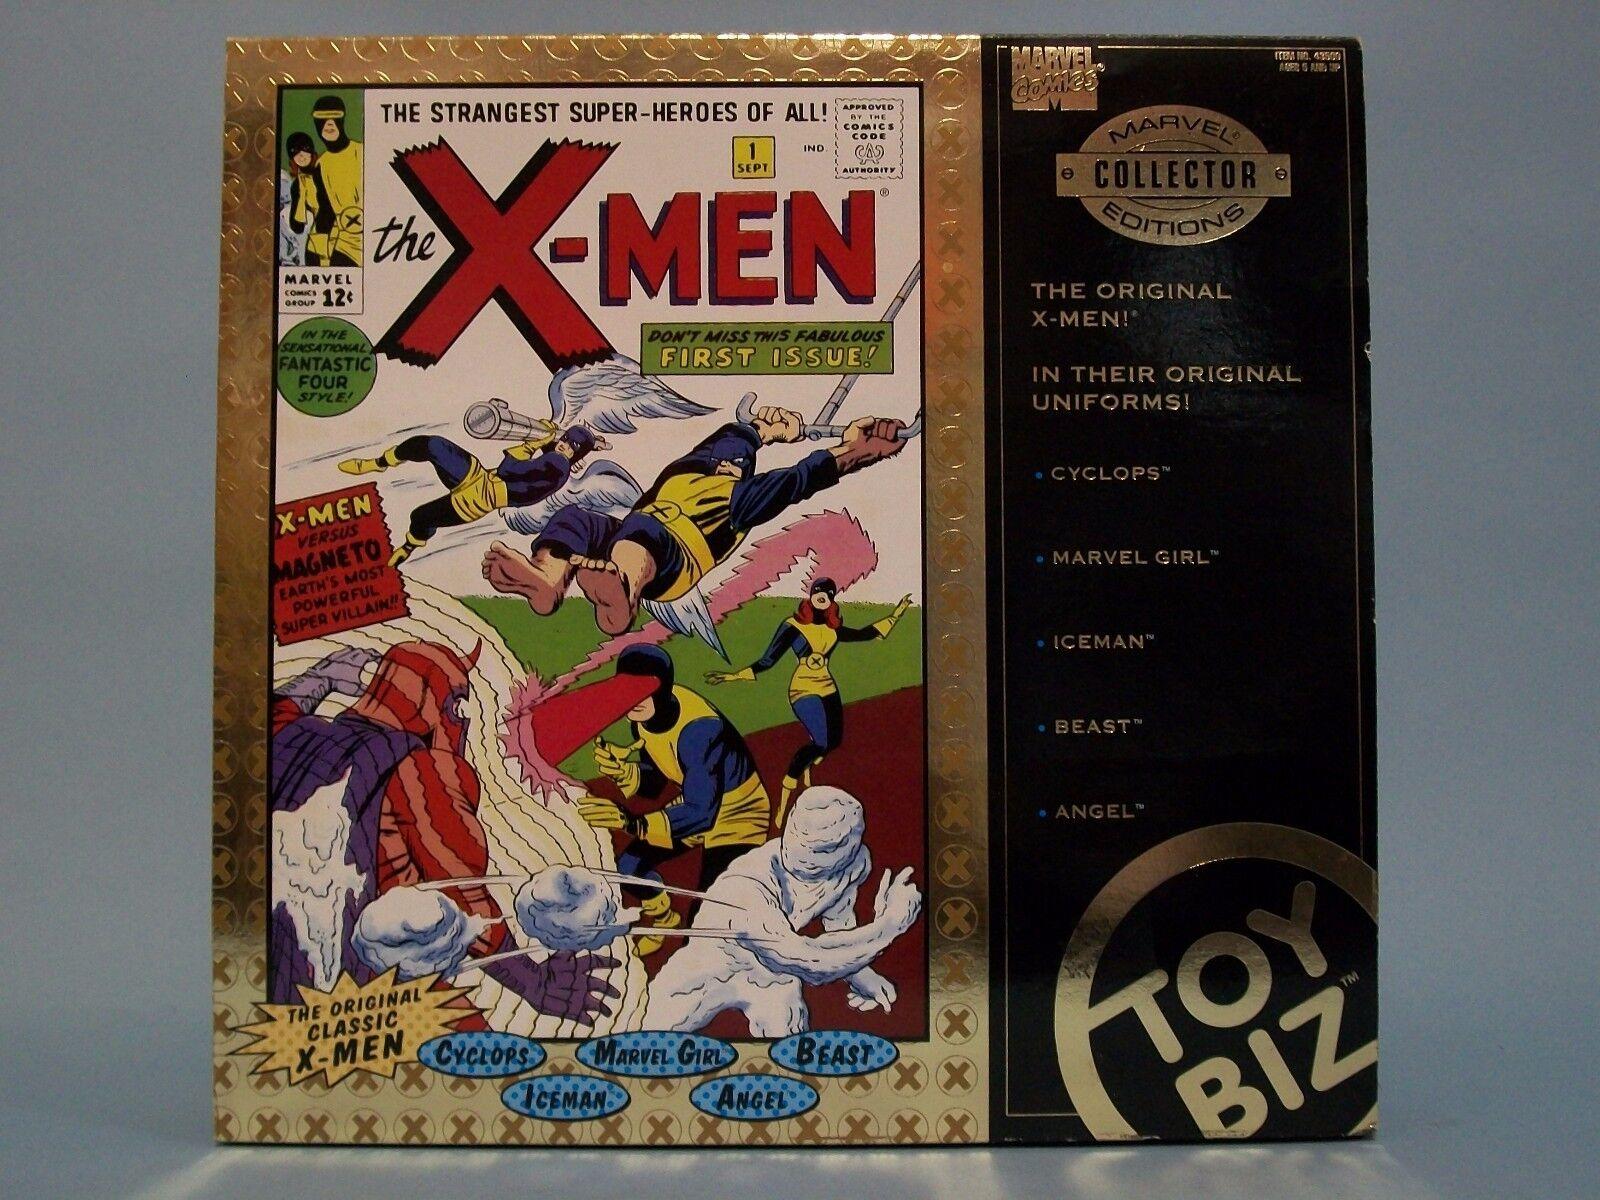 ToyBiz Marvel Collector Editions The Original X-Men Marvel Marvel Marvel Comics Figures 496300